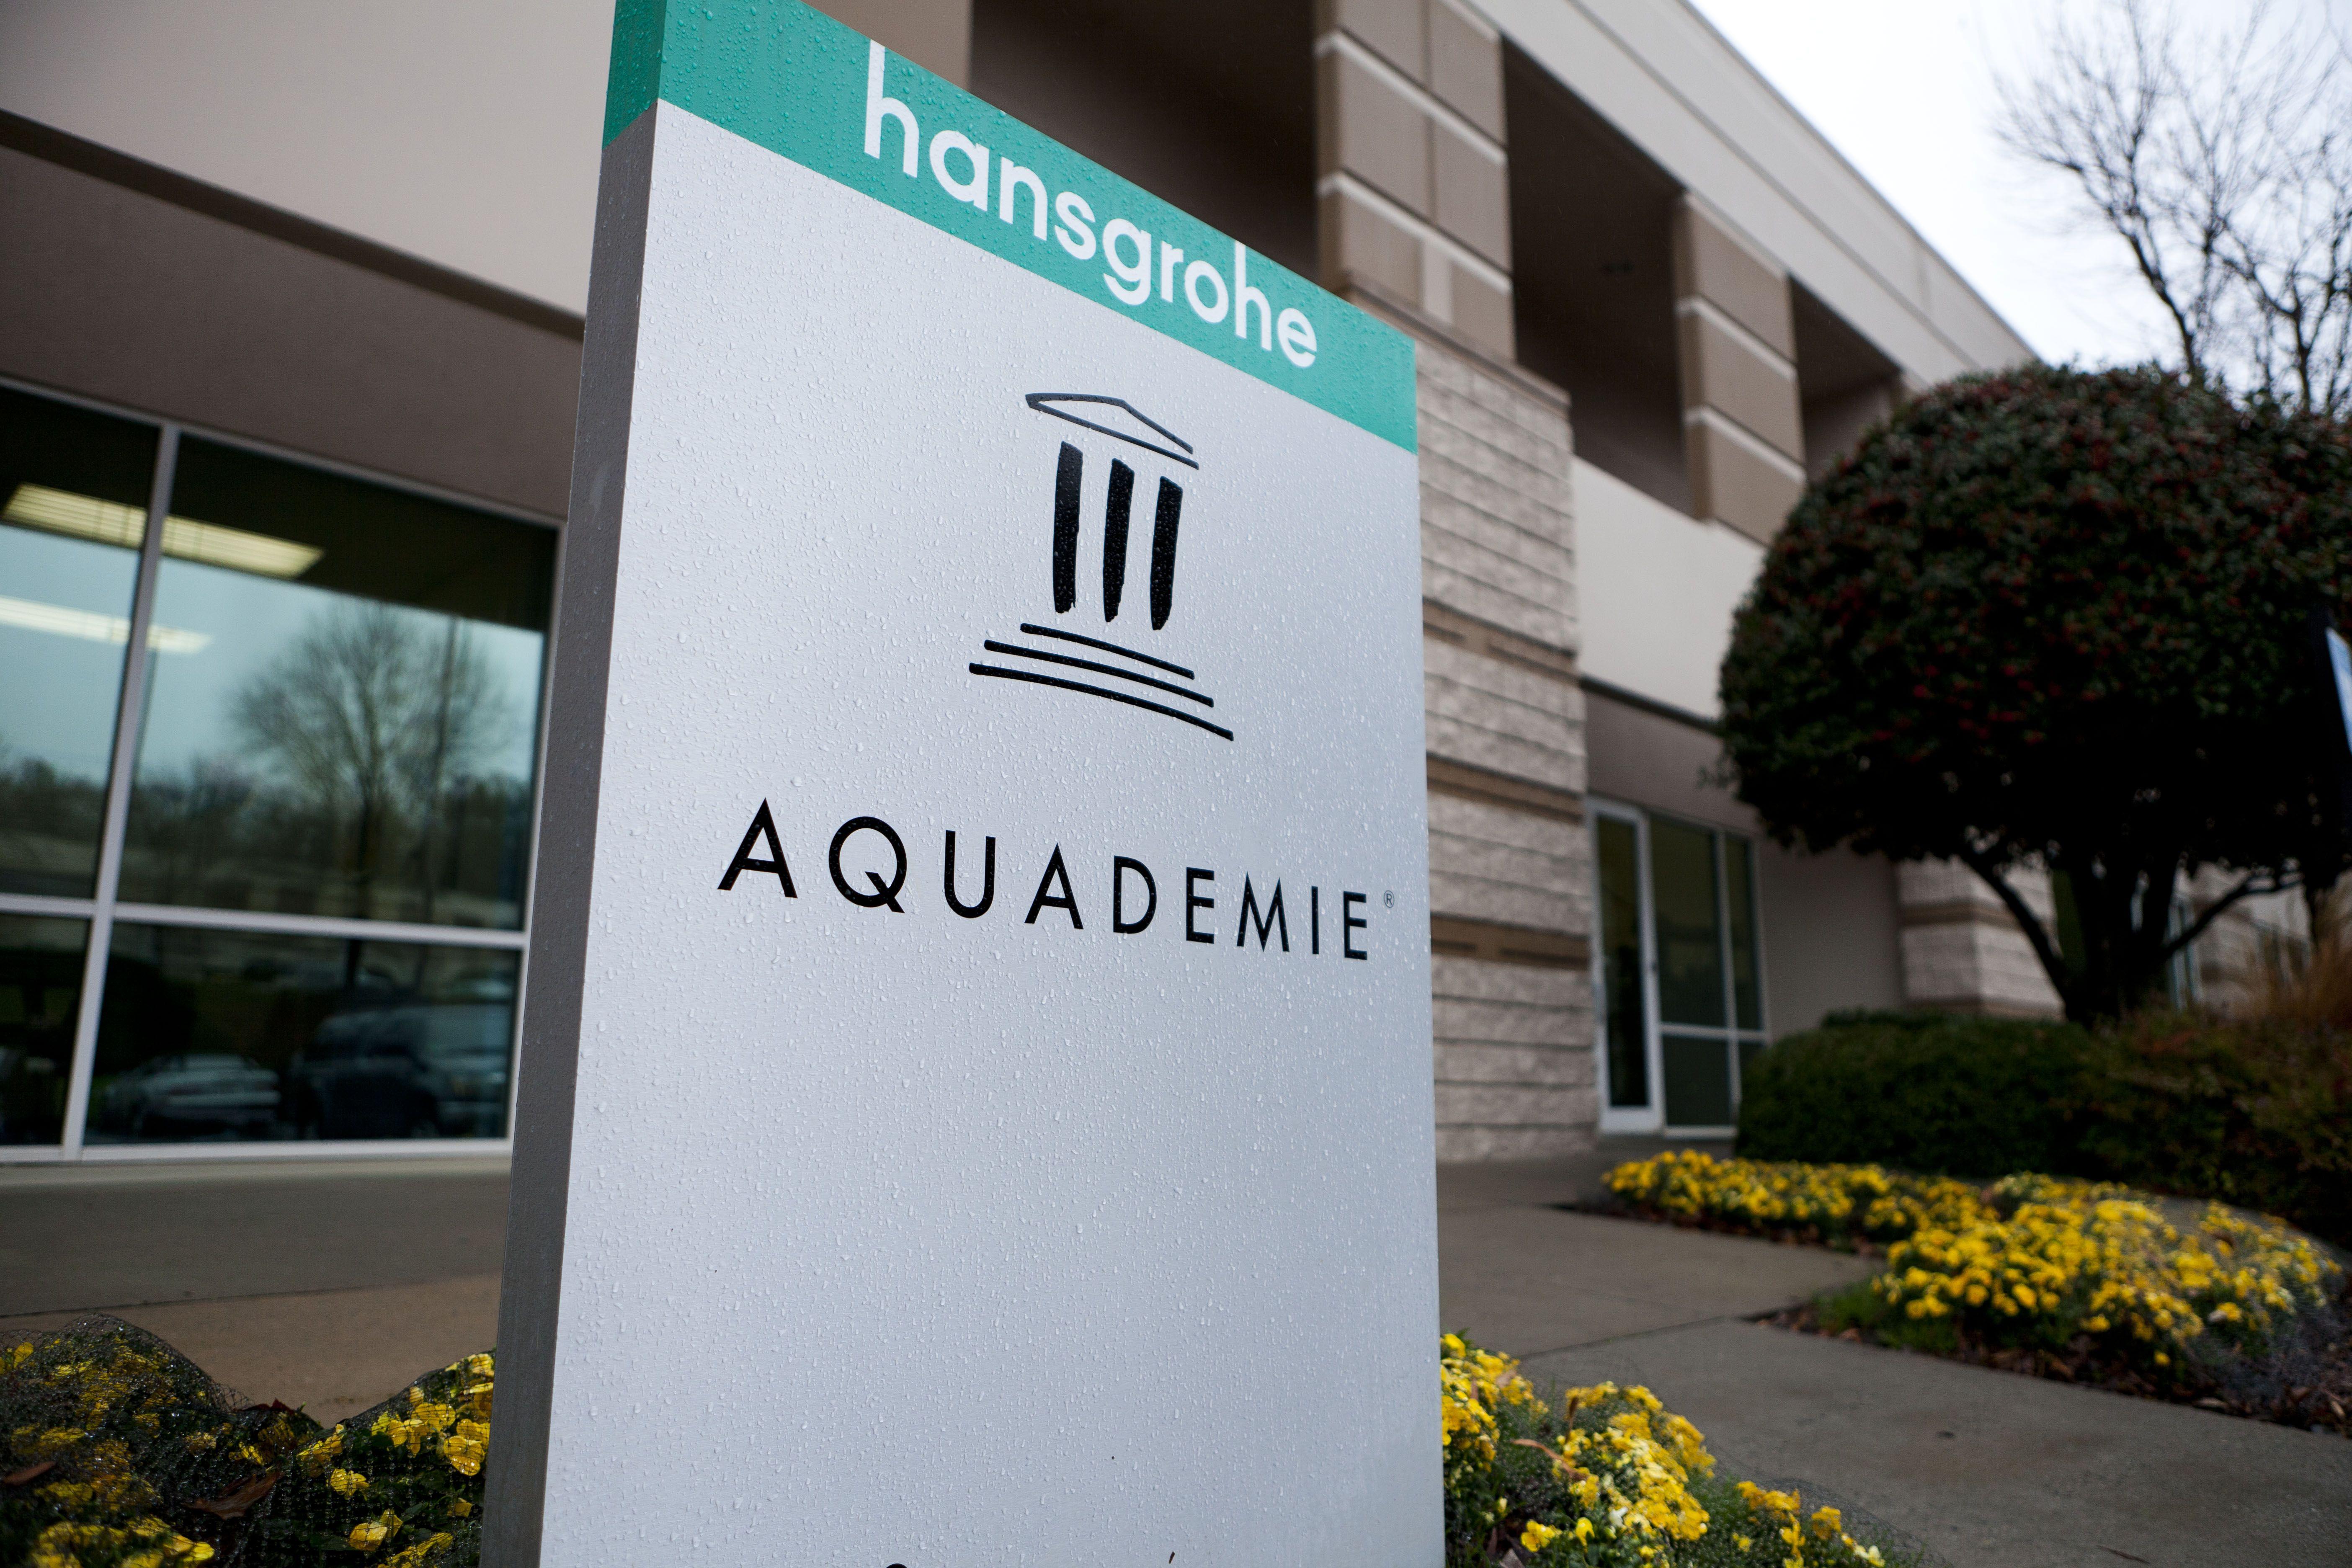 Hansgrohe Aquademie | Home: Flow | Pinterest